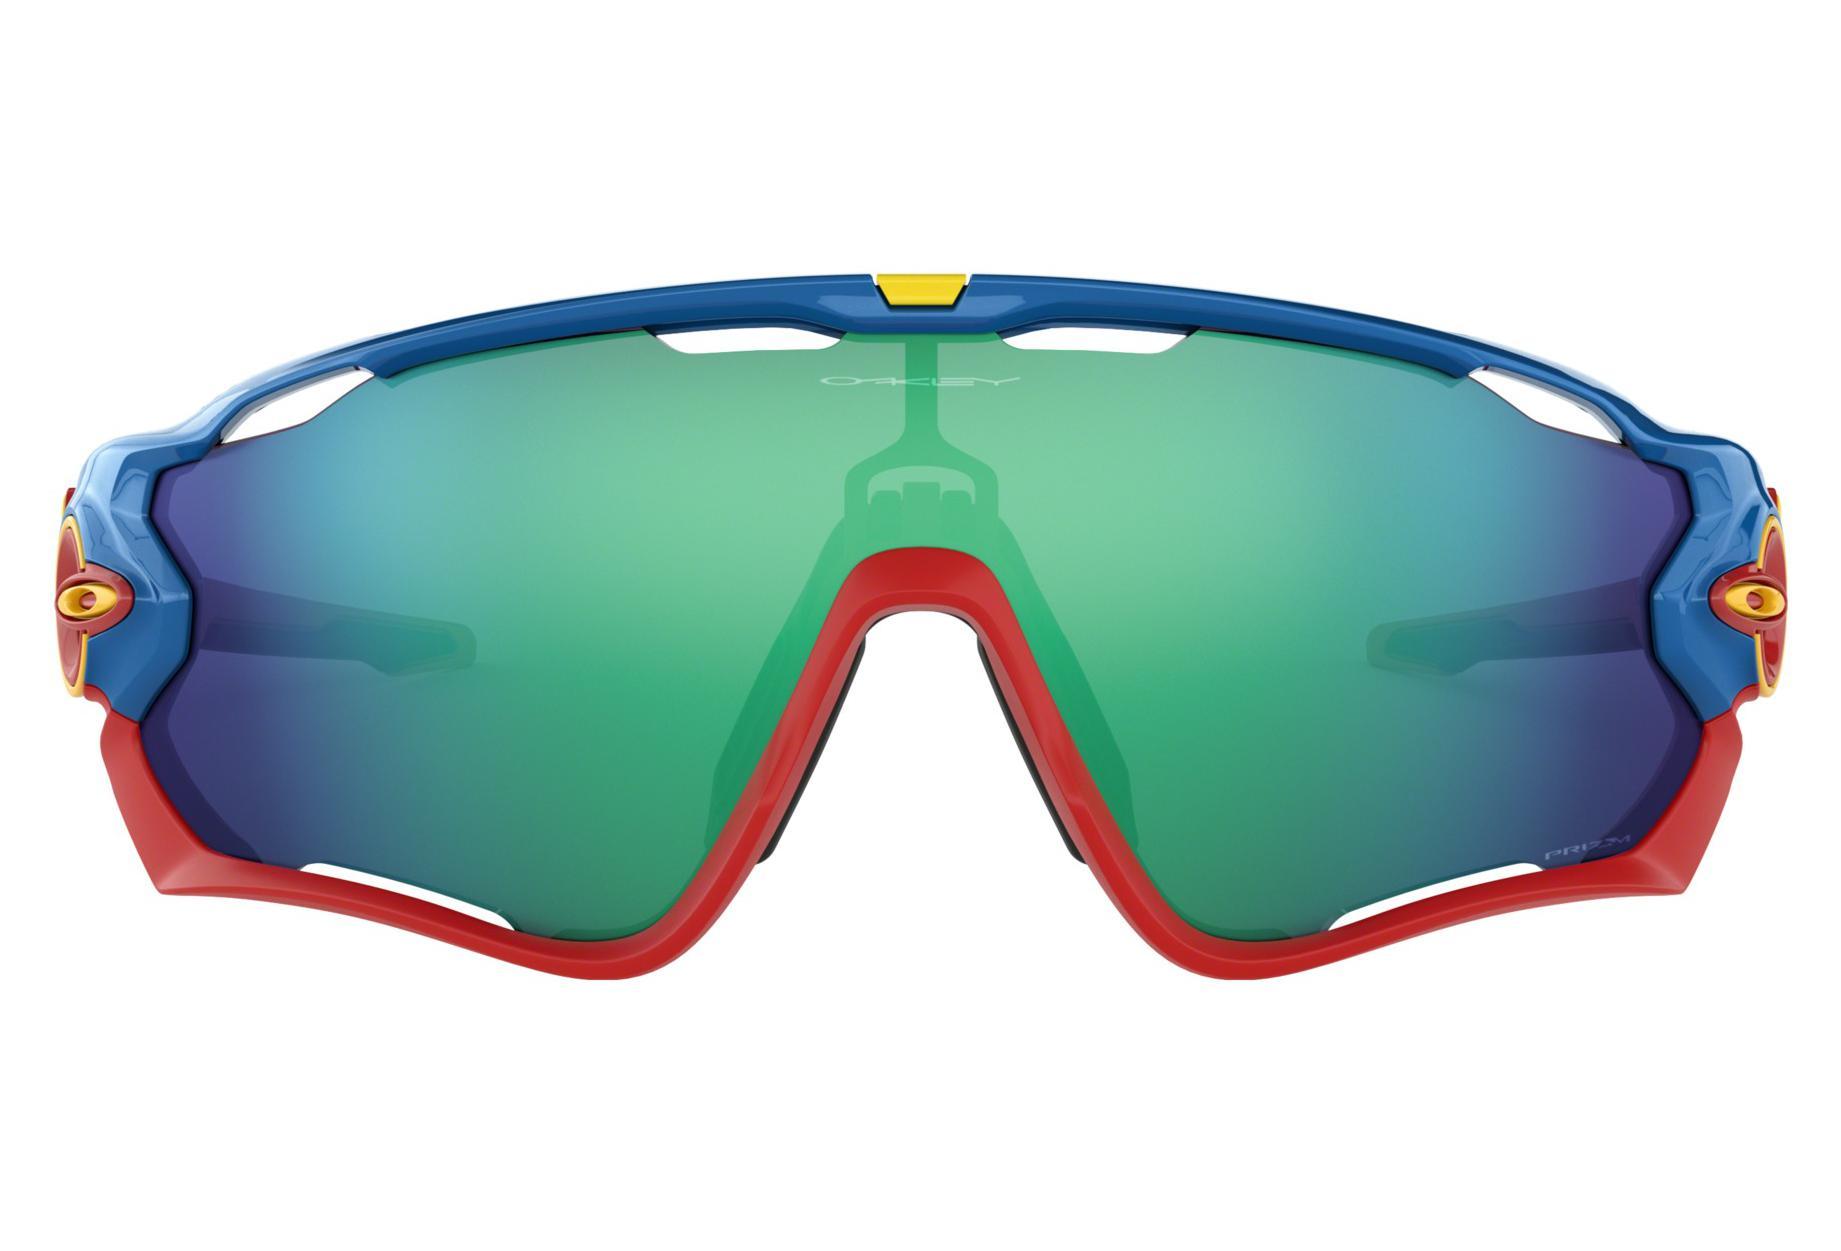 d31b83eab9d72 Gafas de sol Oakley Jawbreaker   Prizm Jade Gris   Azul Rojo   Ref ...